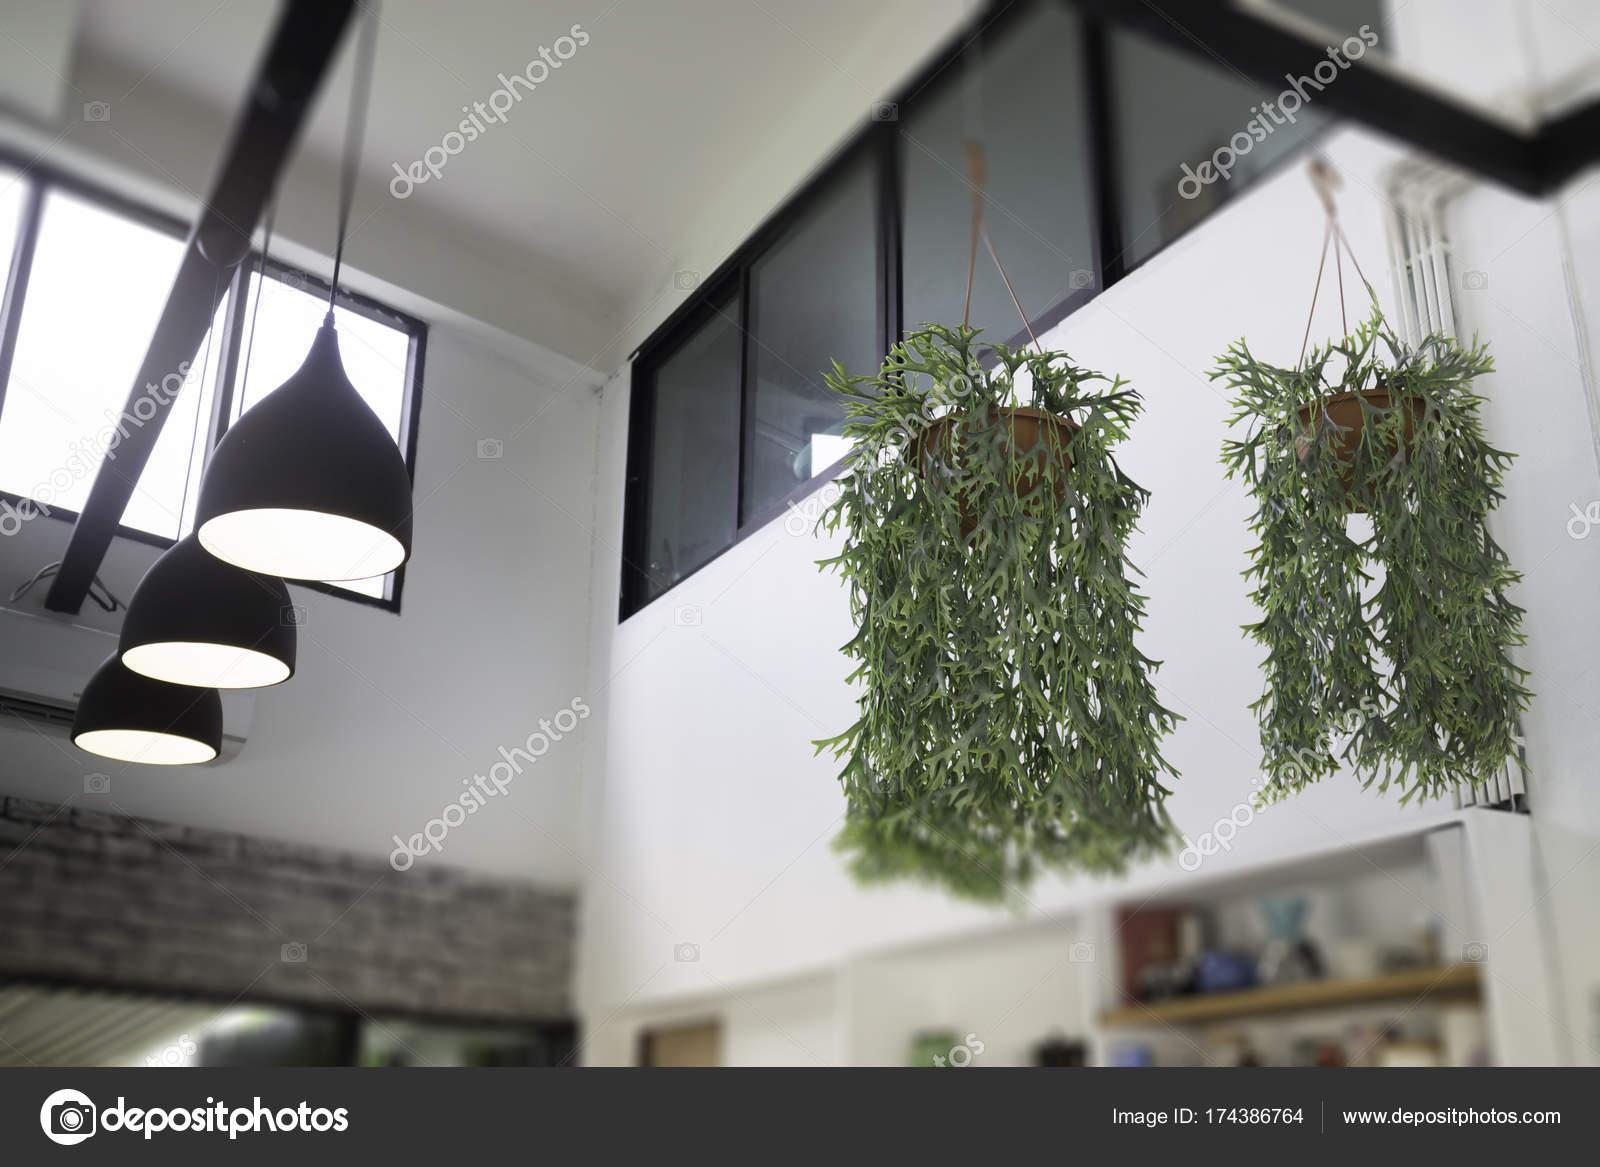 Fern In Plant Pot Hanging On Ceiling Stock Photo C Nalinrat 174386764